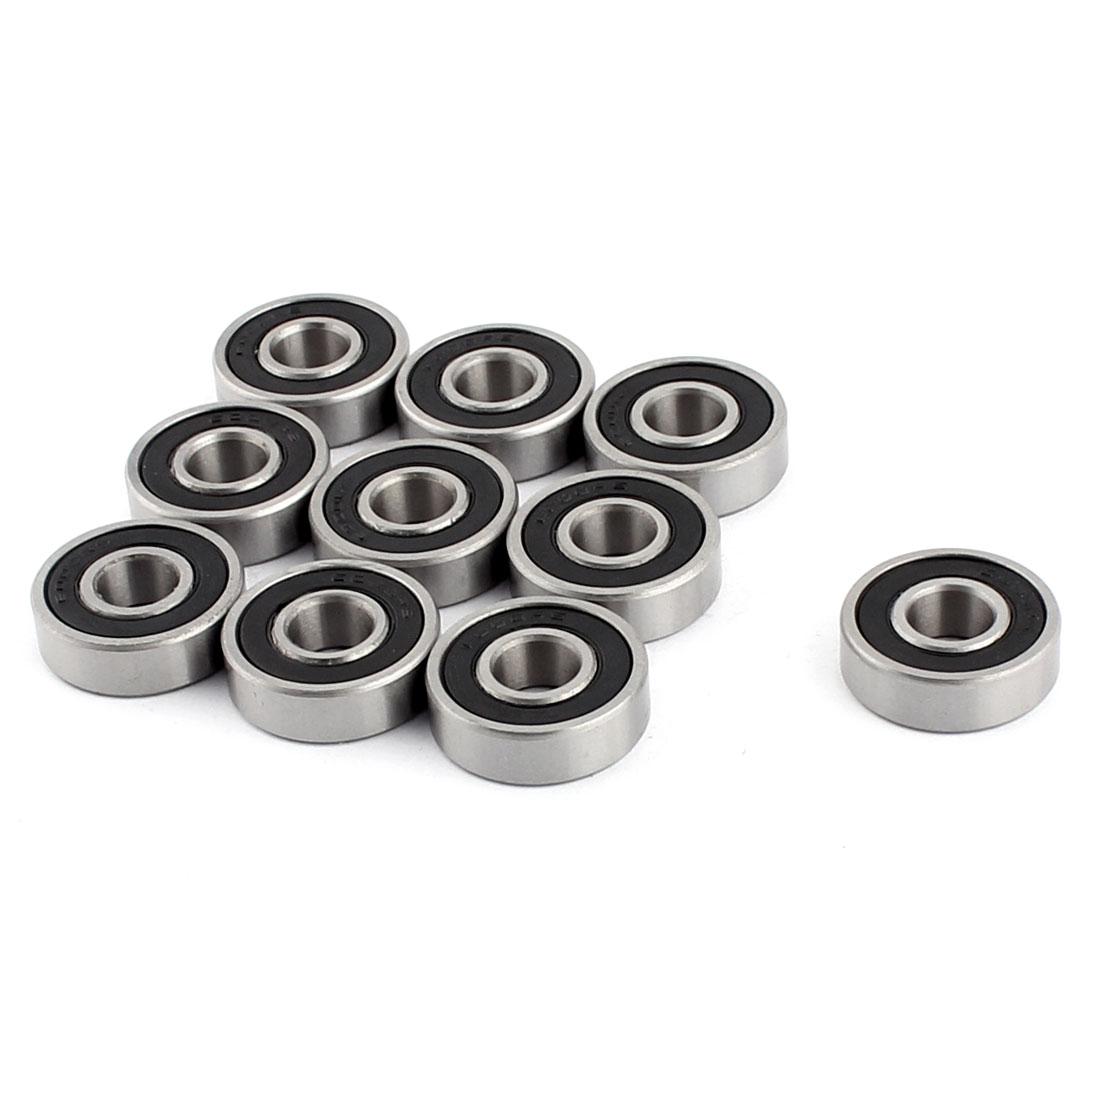 10pcs 6000RS 26mm x 10mm Metal Shielded Deep Groove Ball Bearing Wheel